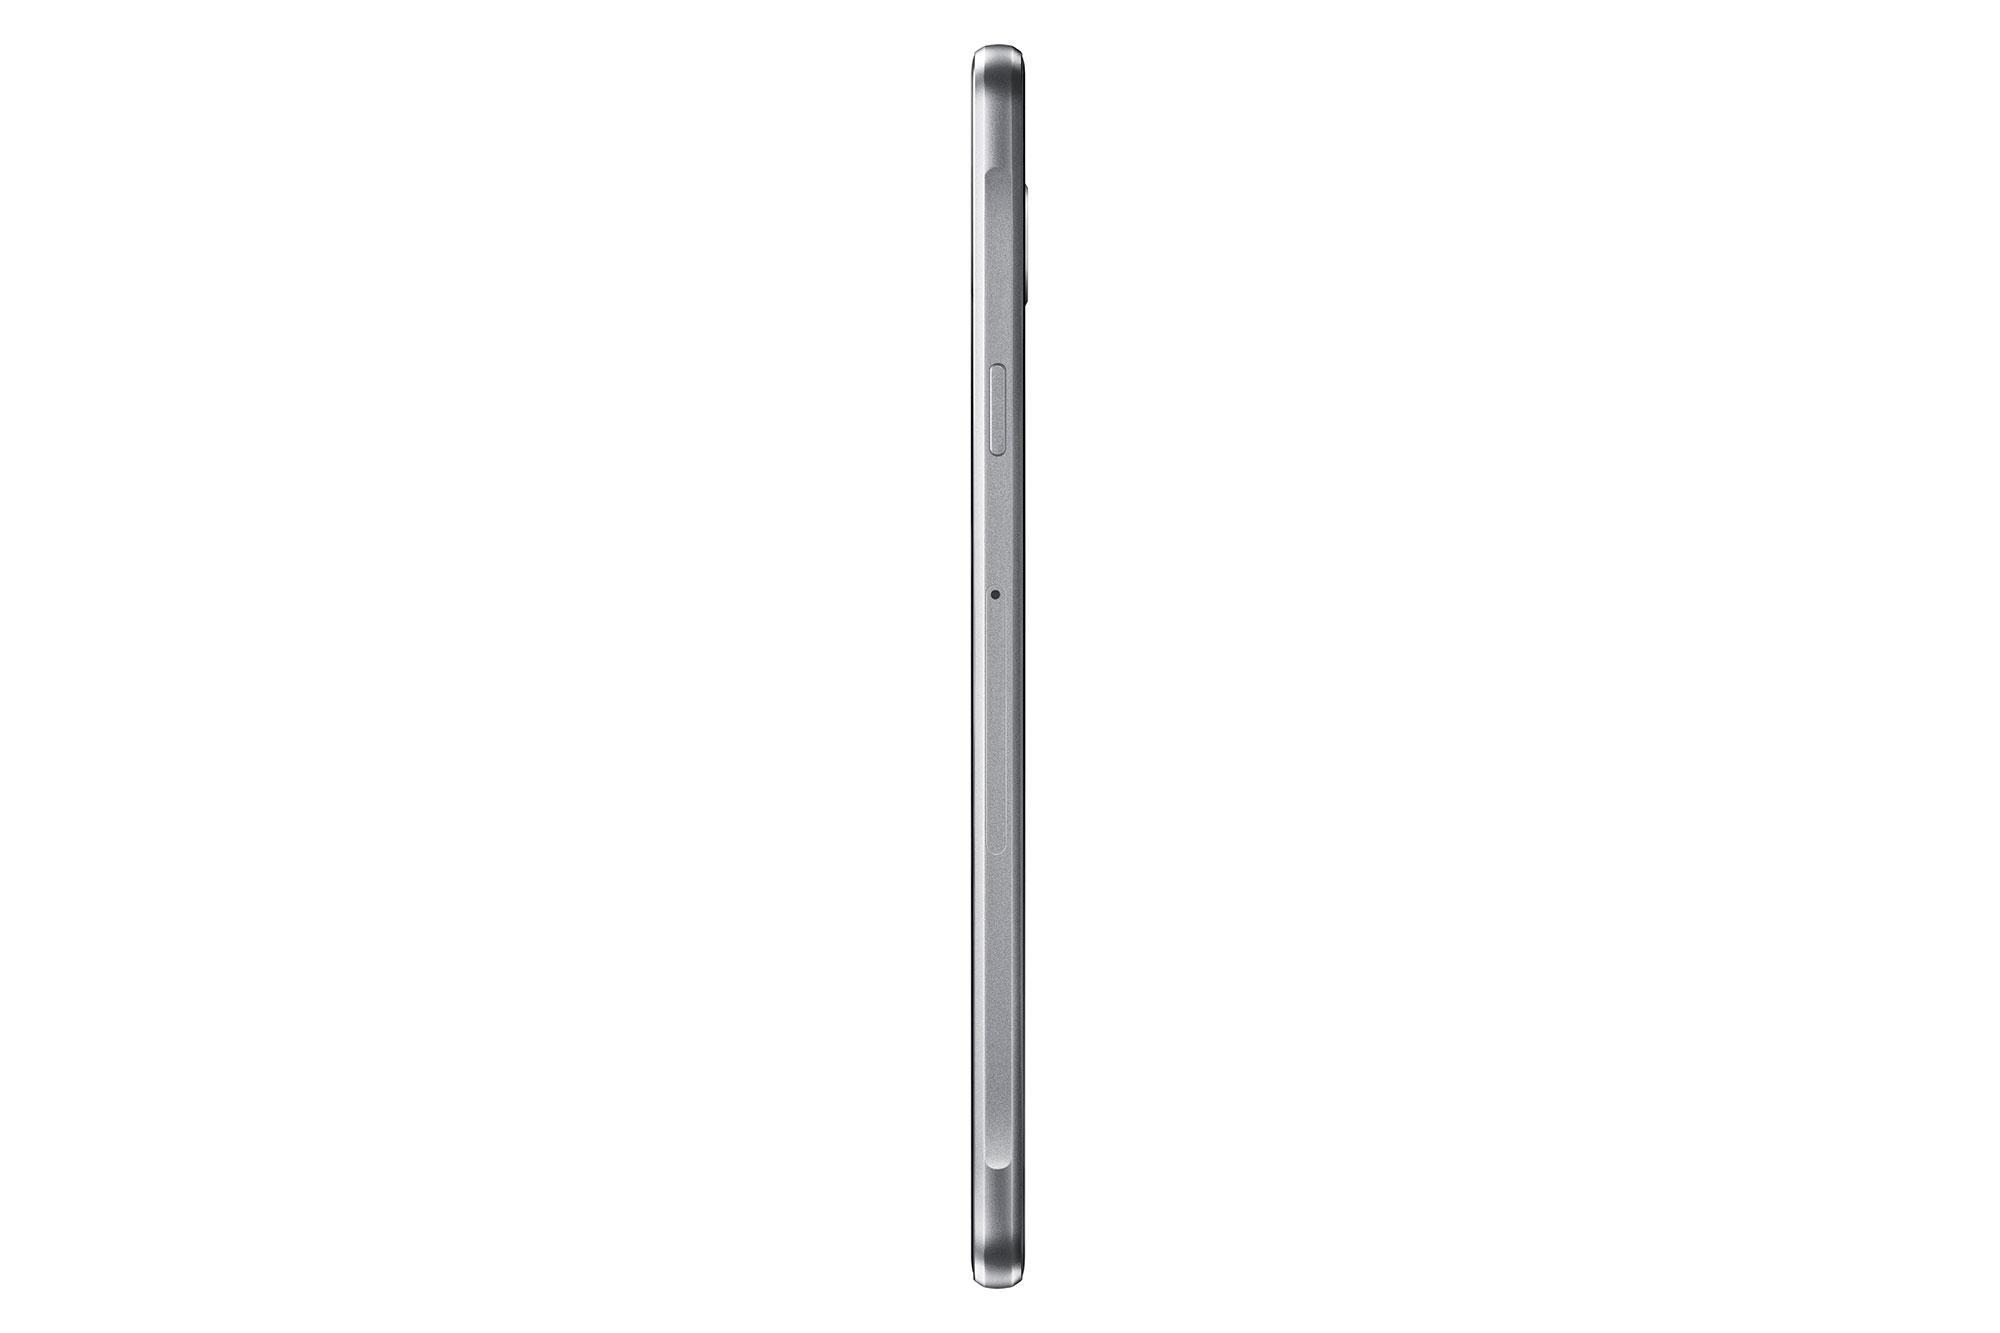 Samsung Galaxy A3 2016 perfil